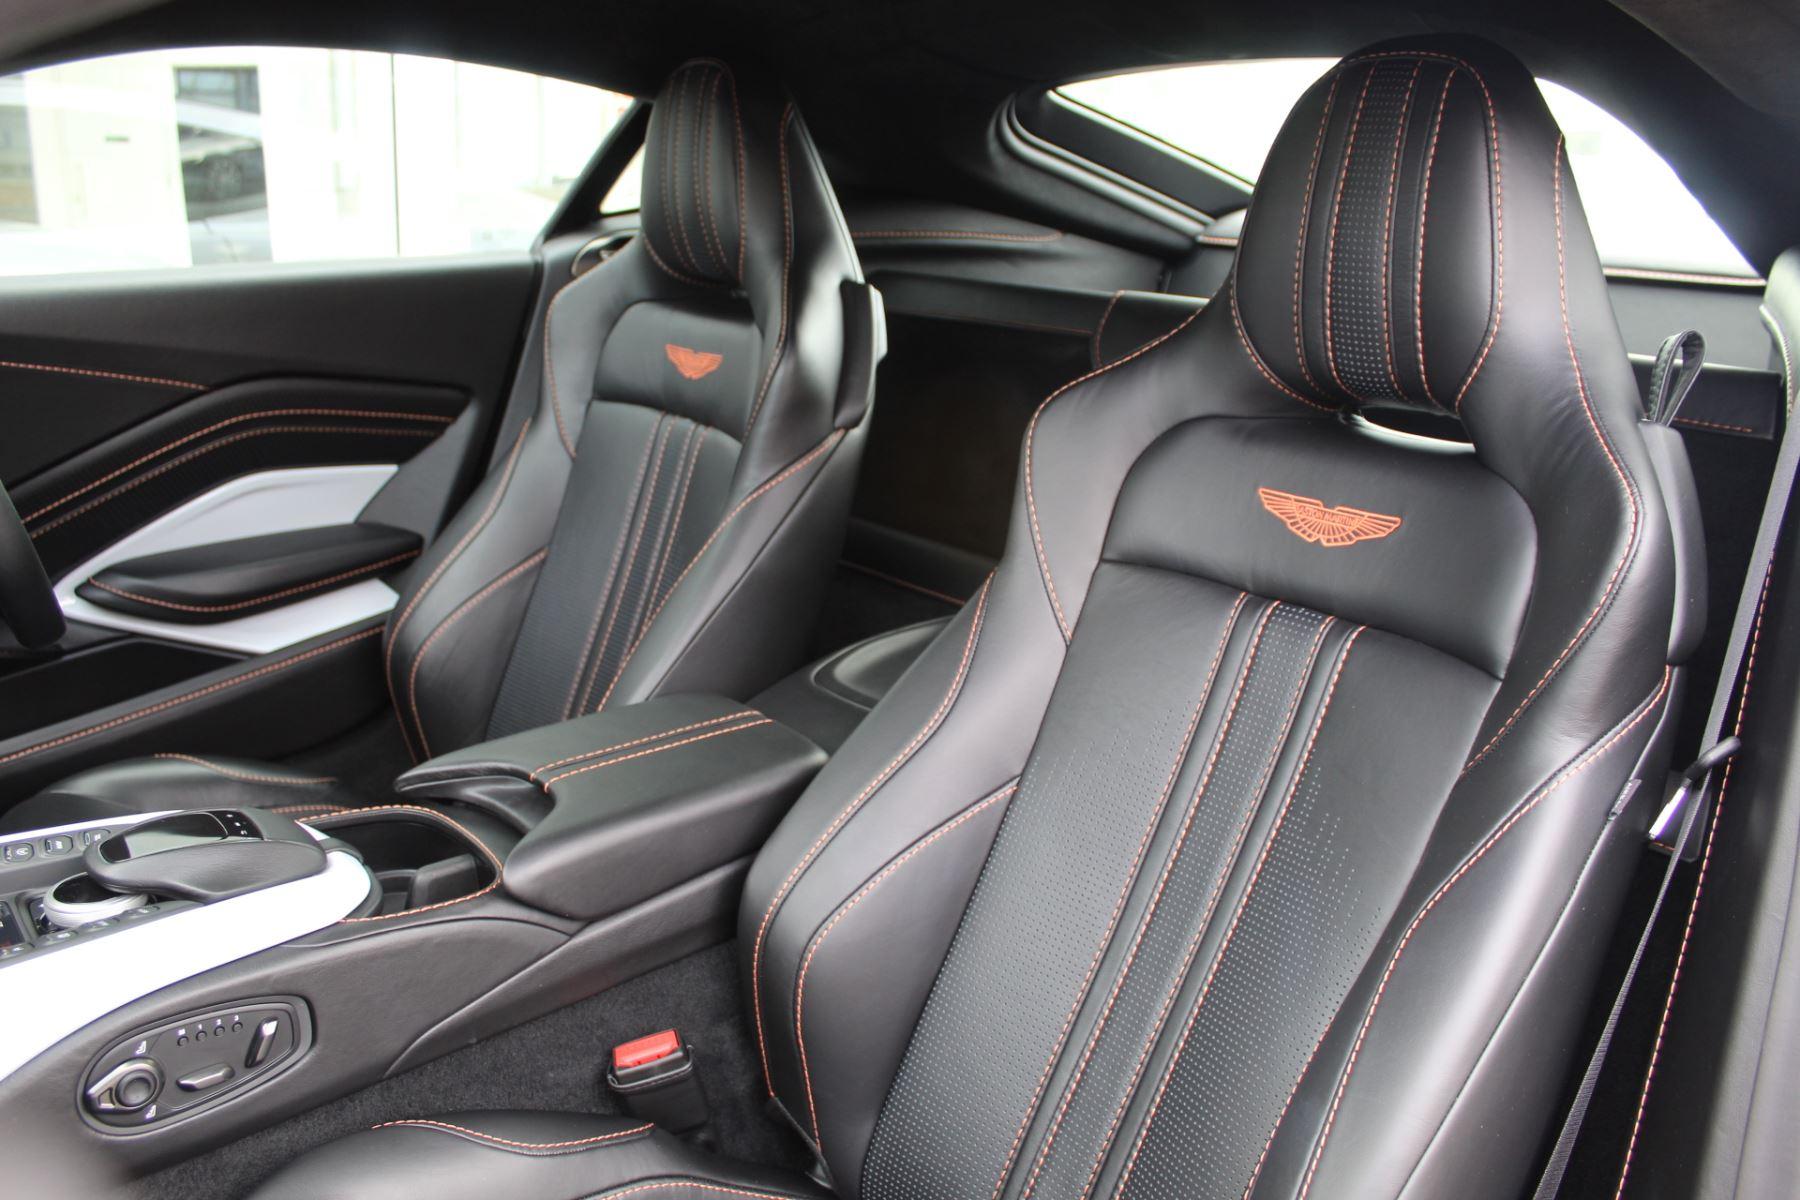 Aston Martin New Vantage 2dr ZF 8 Speed image 11